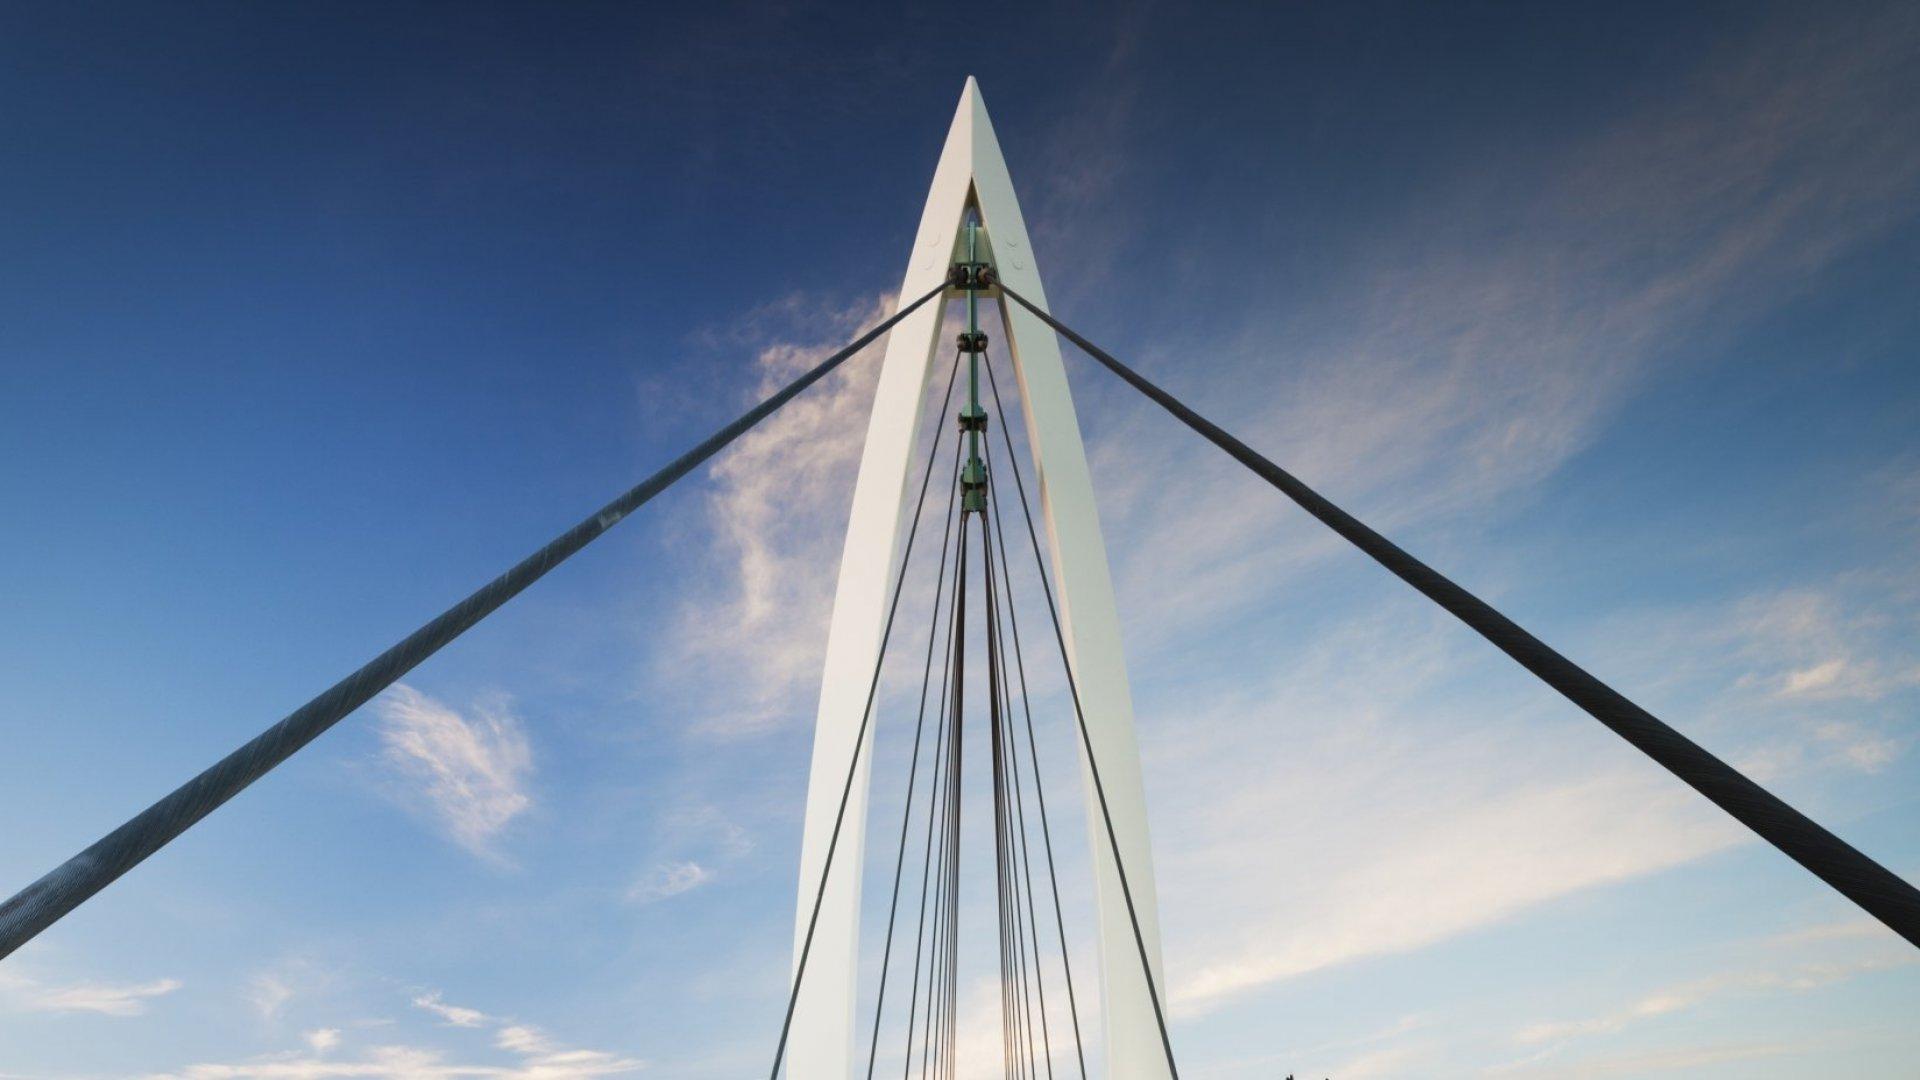 Keeper of the Plains footbridge in Wichita.